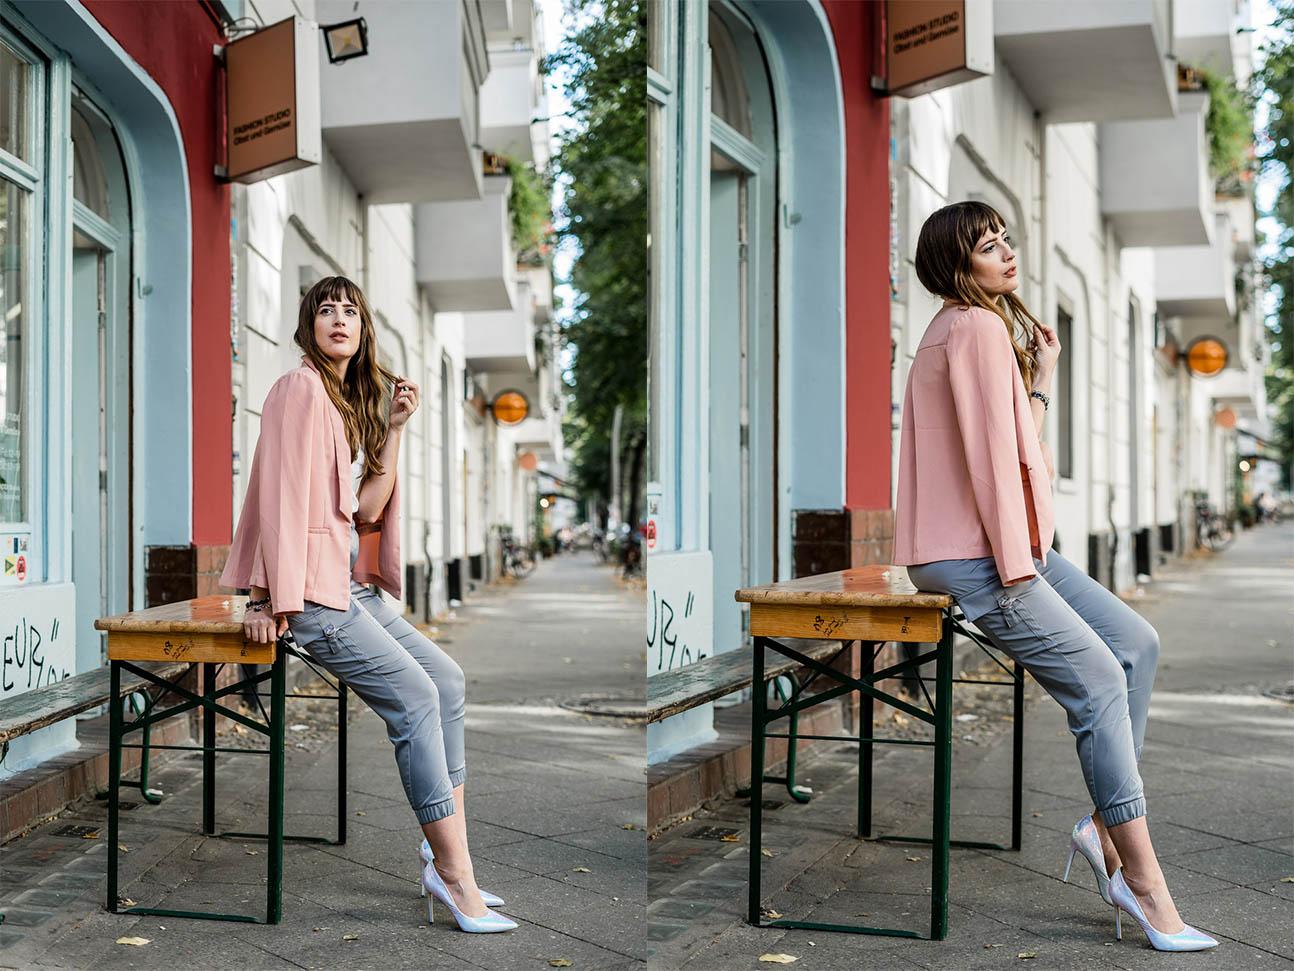 3 Koreanische Modetrends neu interpretiert